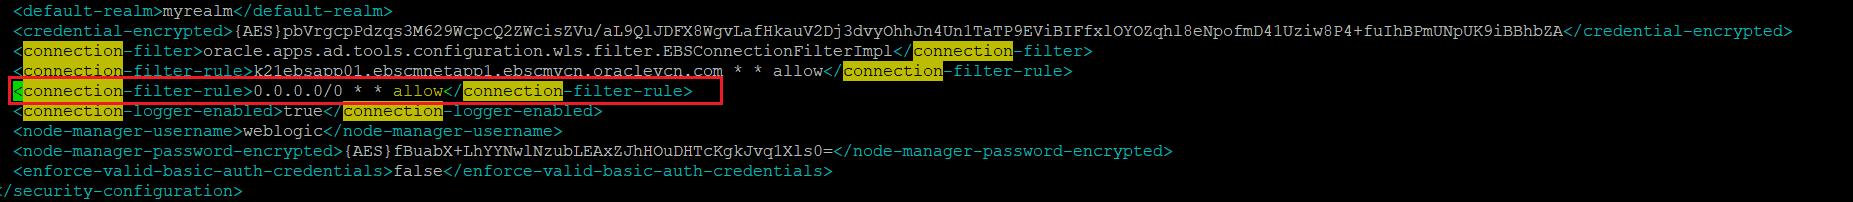 Weblogic connection Filter